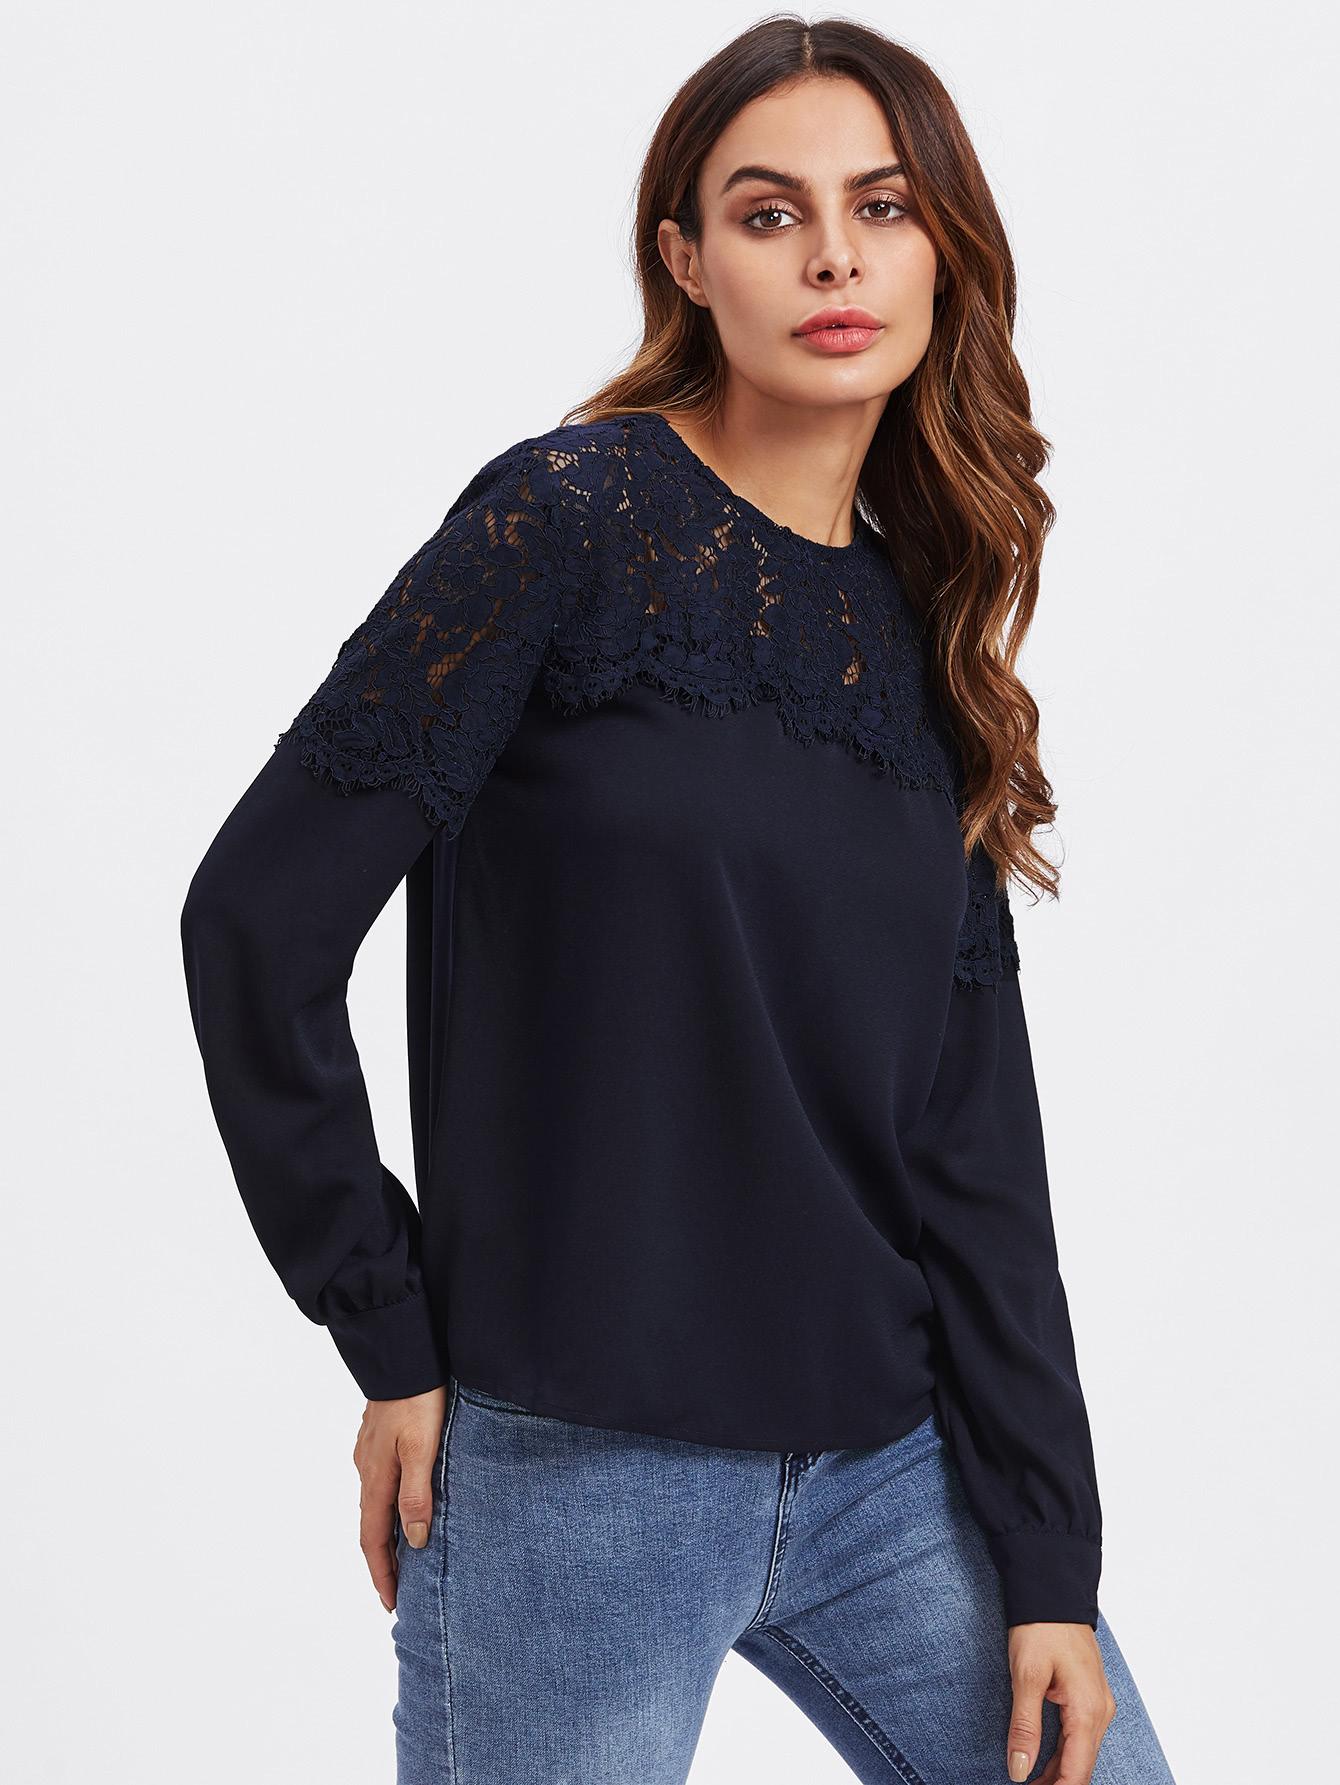 Lace Yoke Buttoned Back Top lace yoke buttoned back top